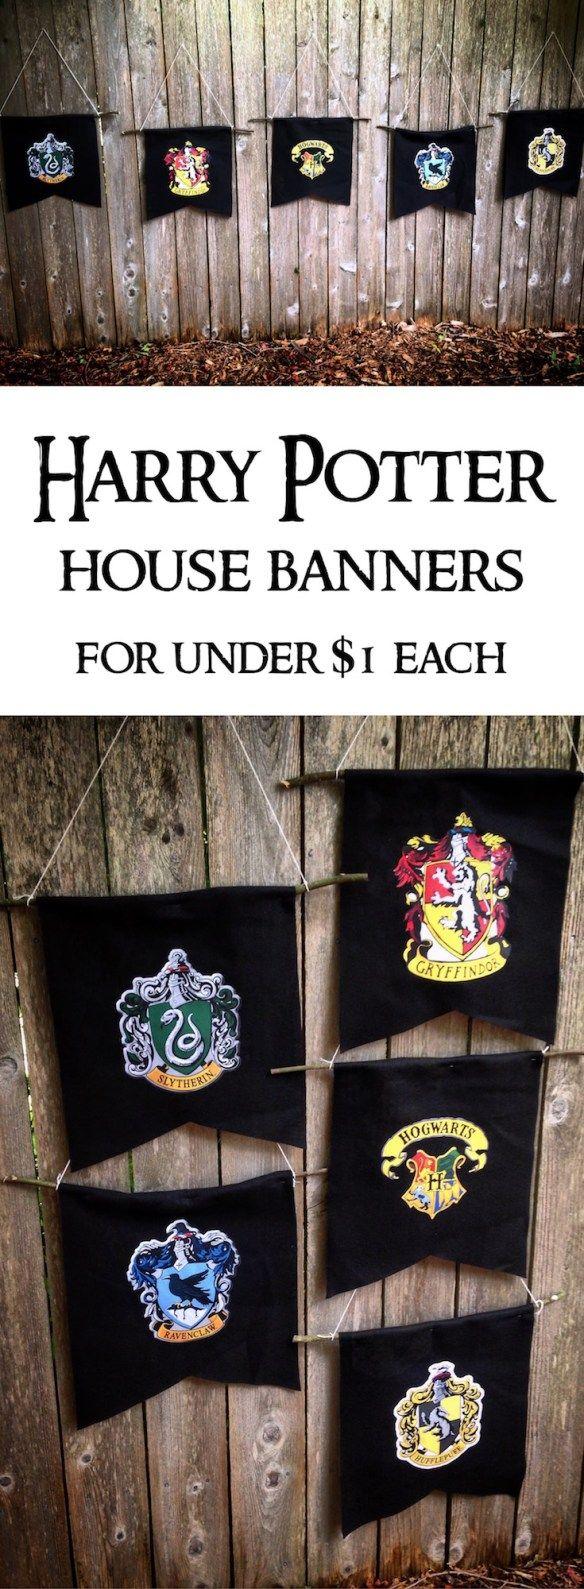 Harry Potter Hogwarts House Banners DIY | Harry potter ...